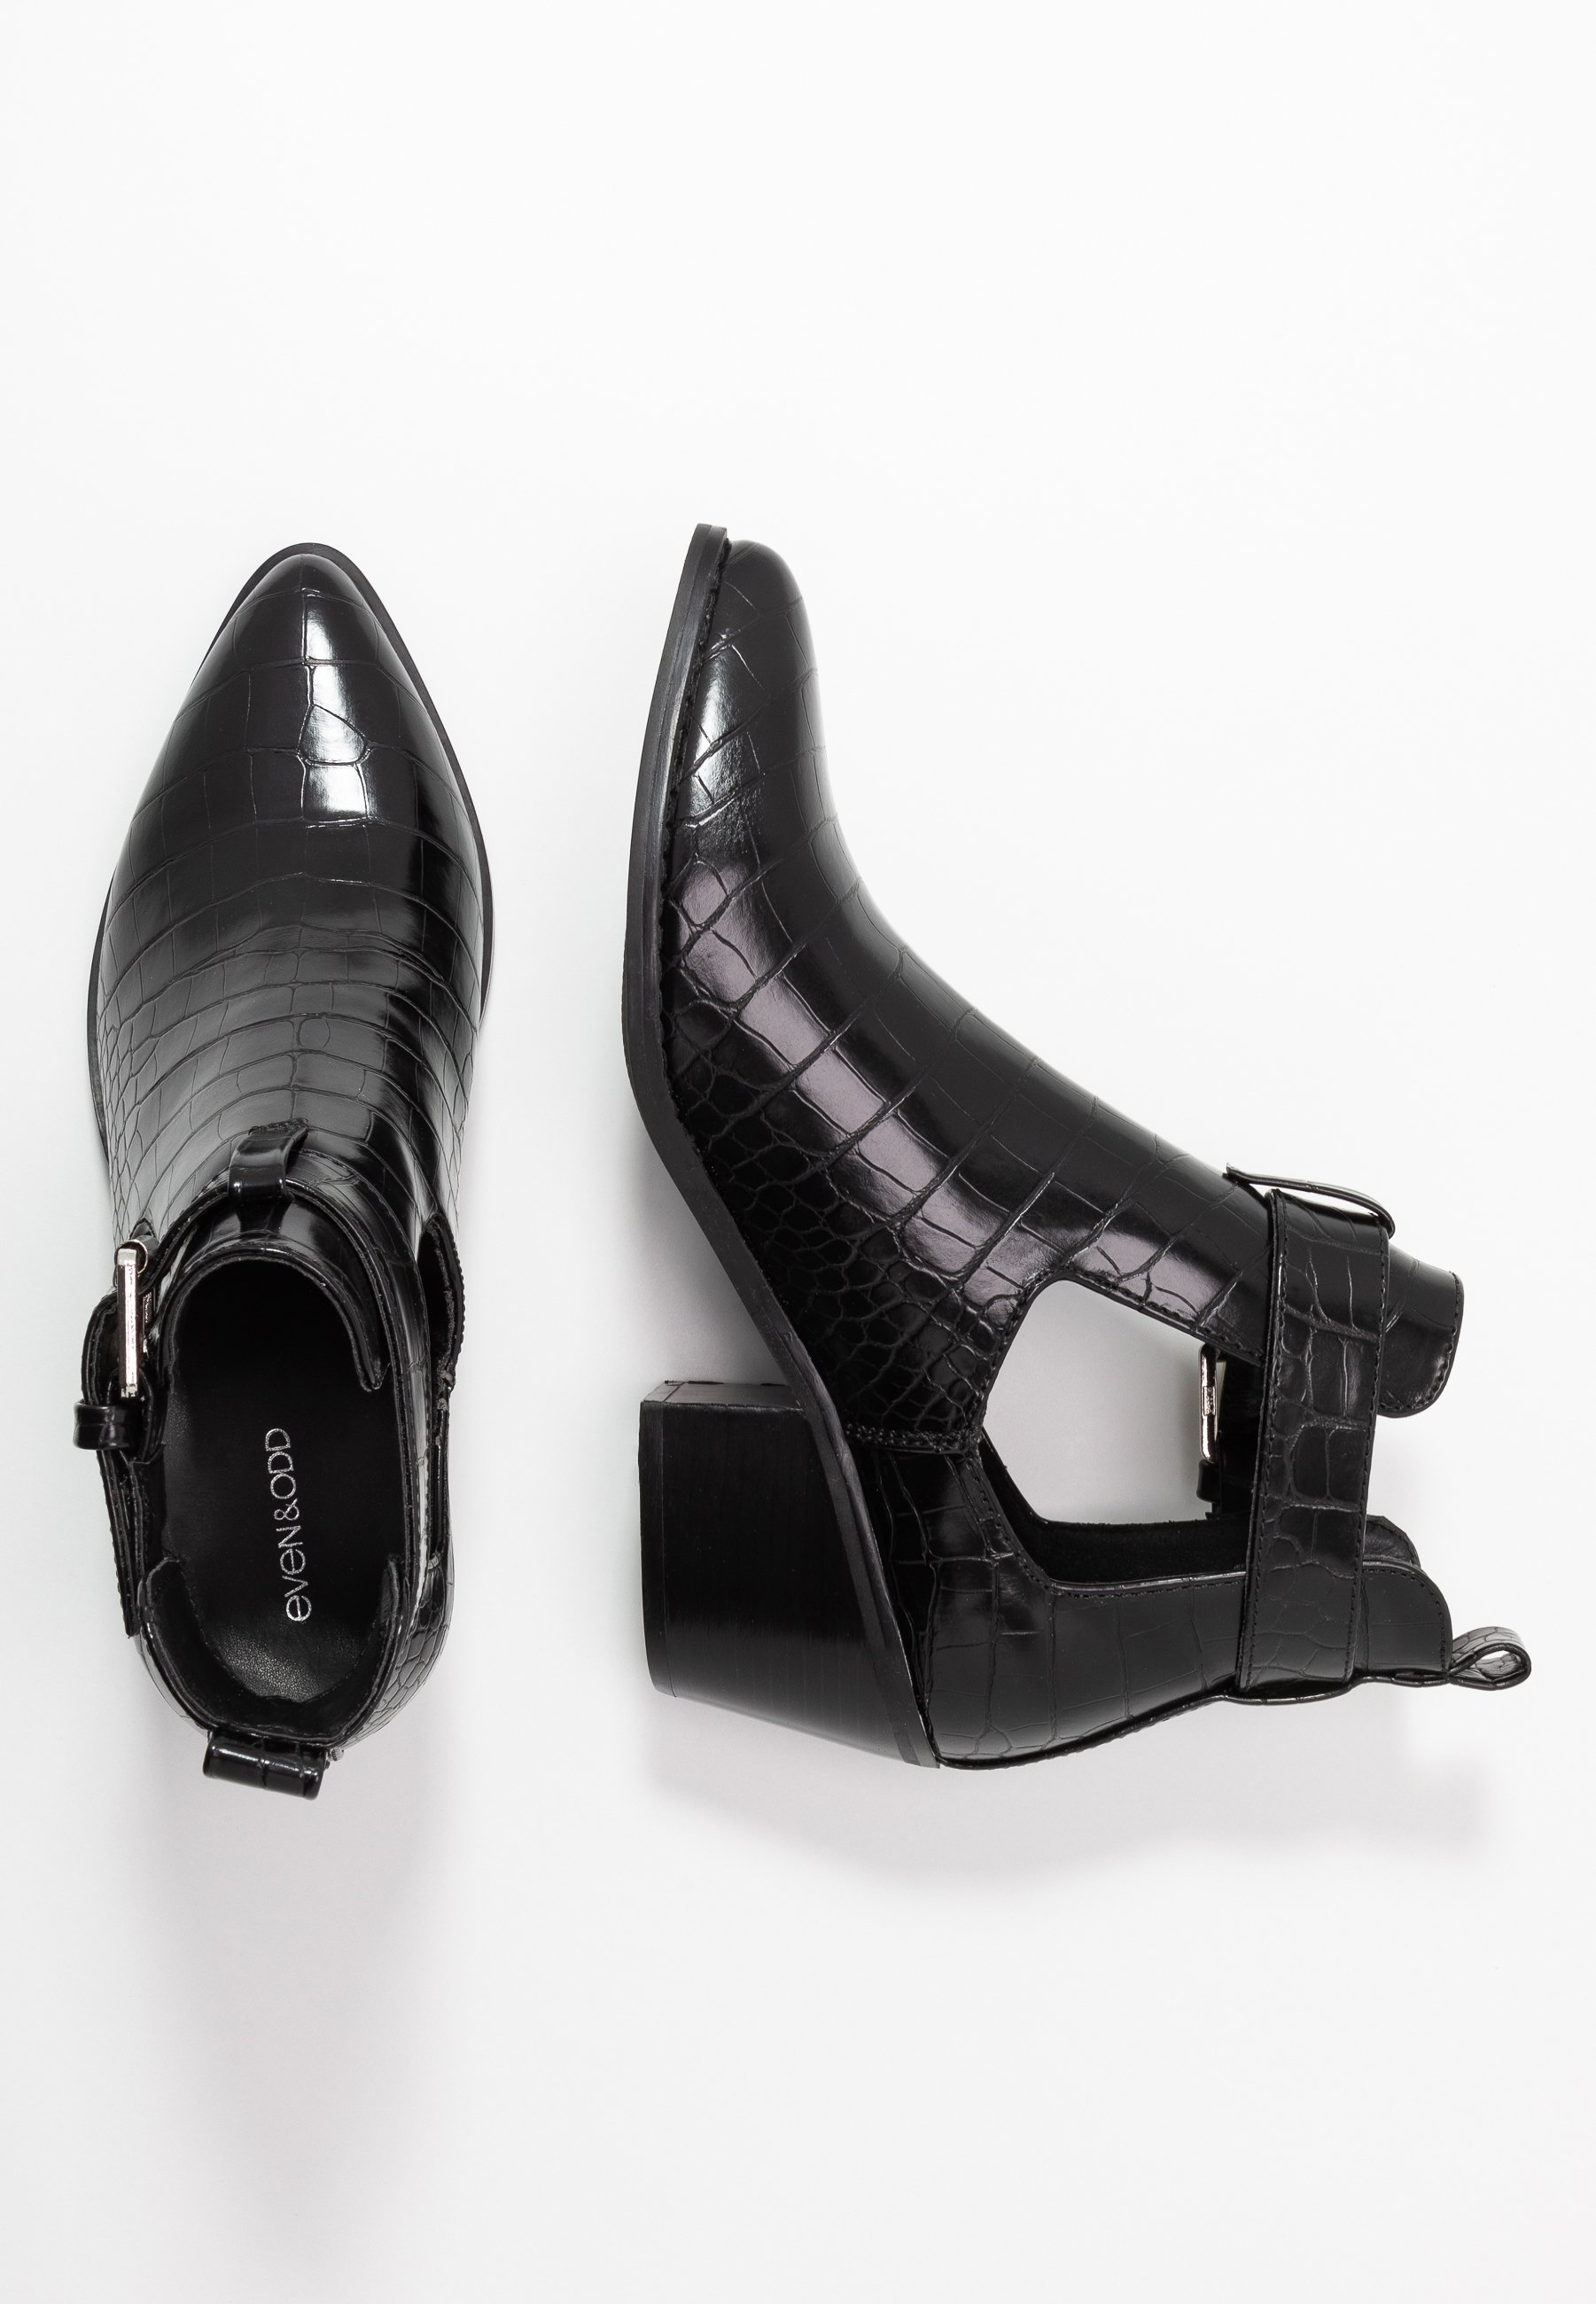 Even&odd Ankelboots - Black